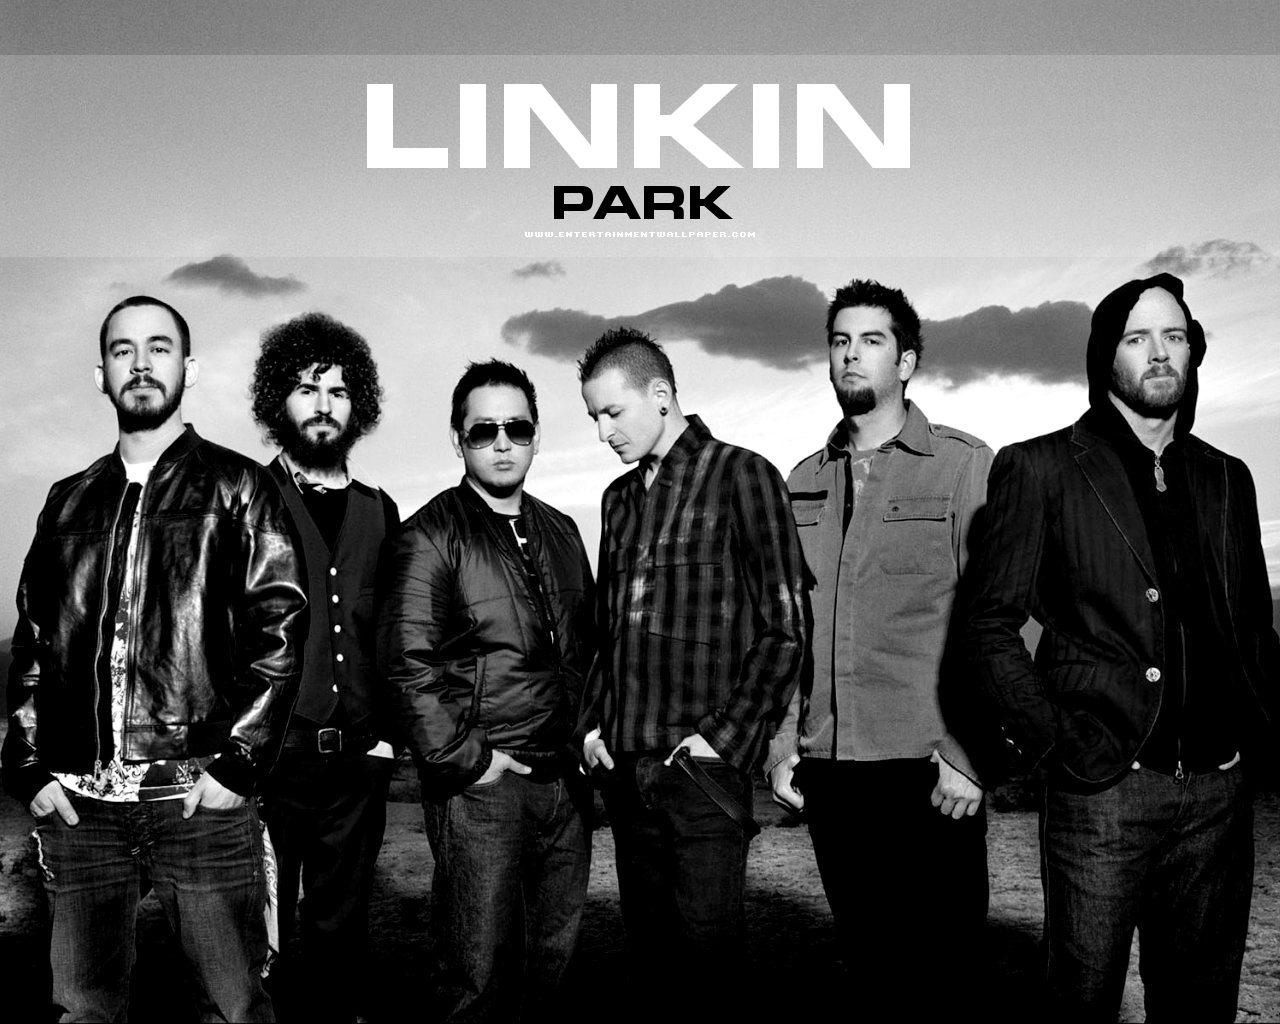 Linkin Park Wallpaper 1280x1024 54894